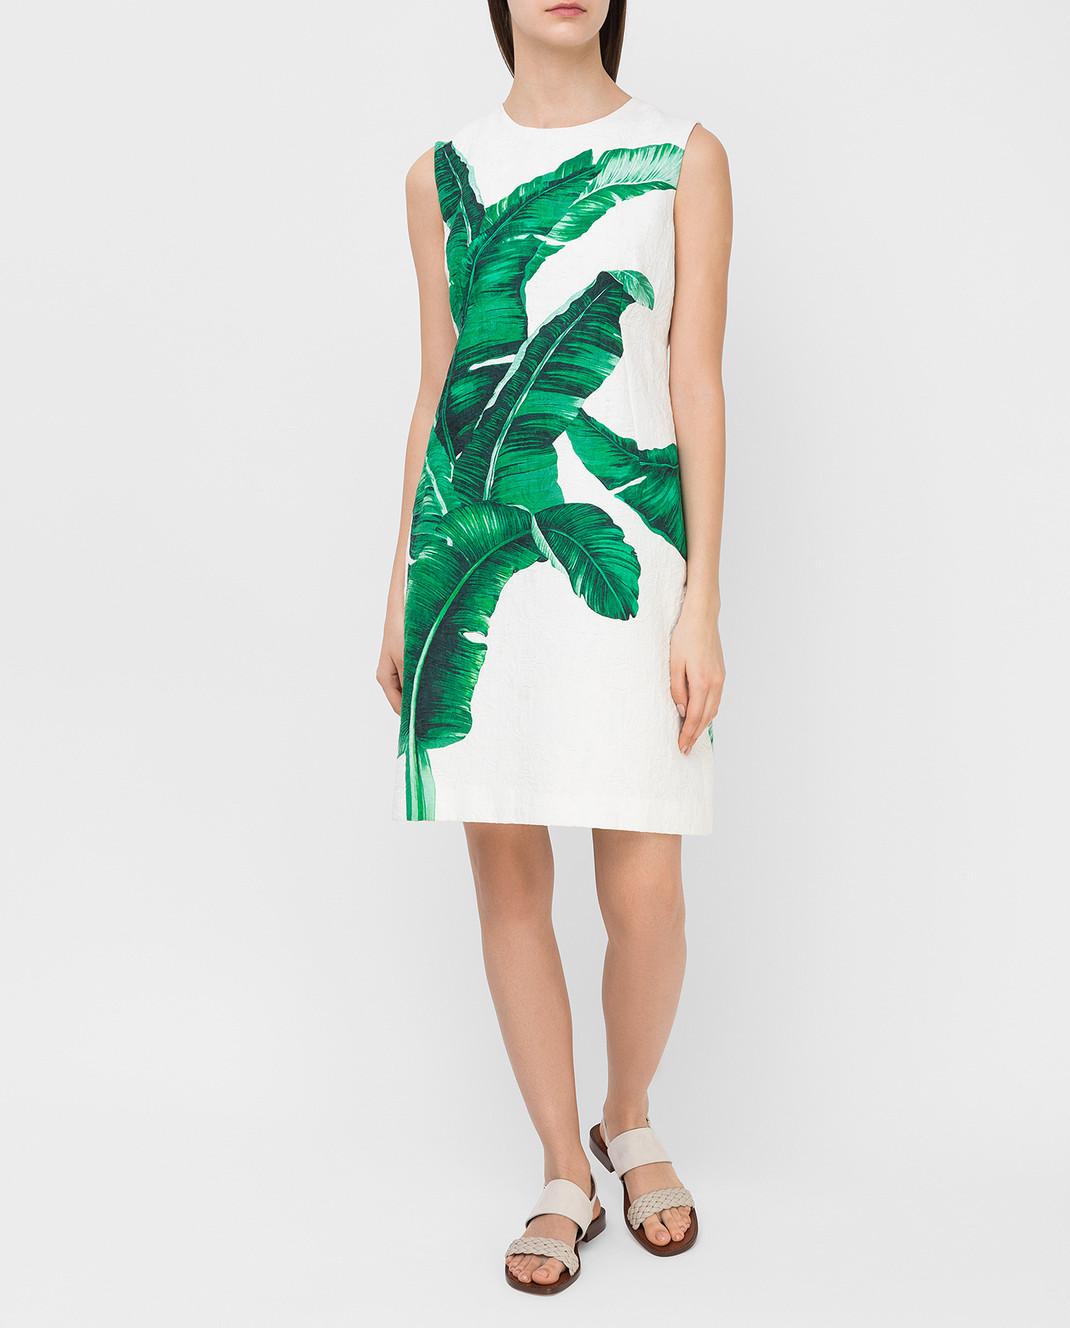 Dolce&Gabbana Белое платье F6XY4TFSMY7 изображение 2